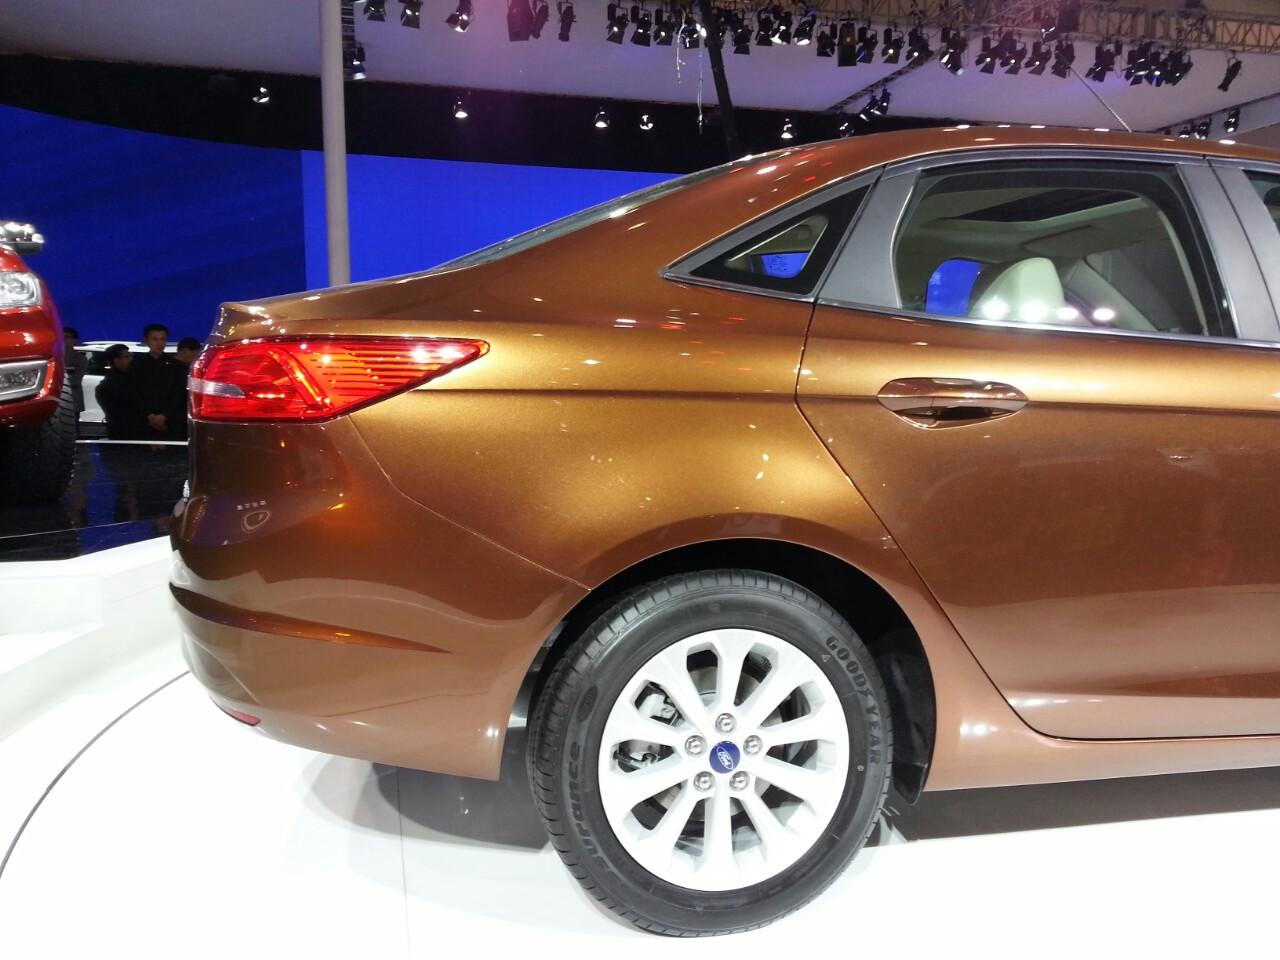 Ford Escort boot at Auto China 2014